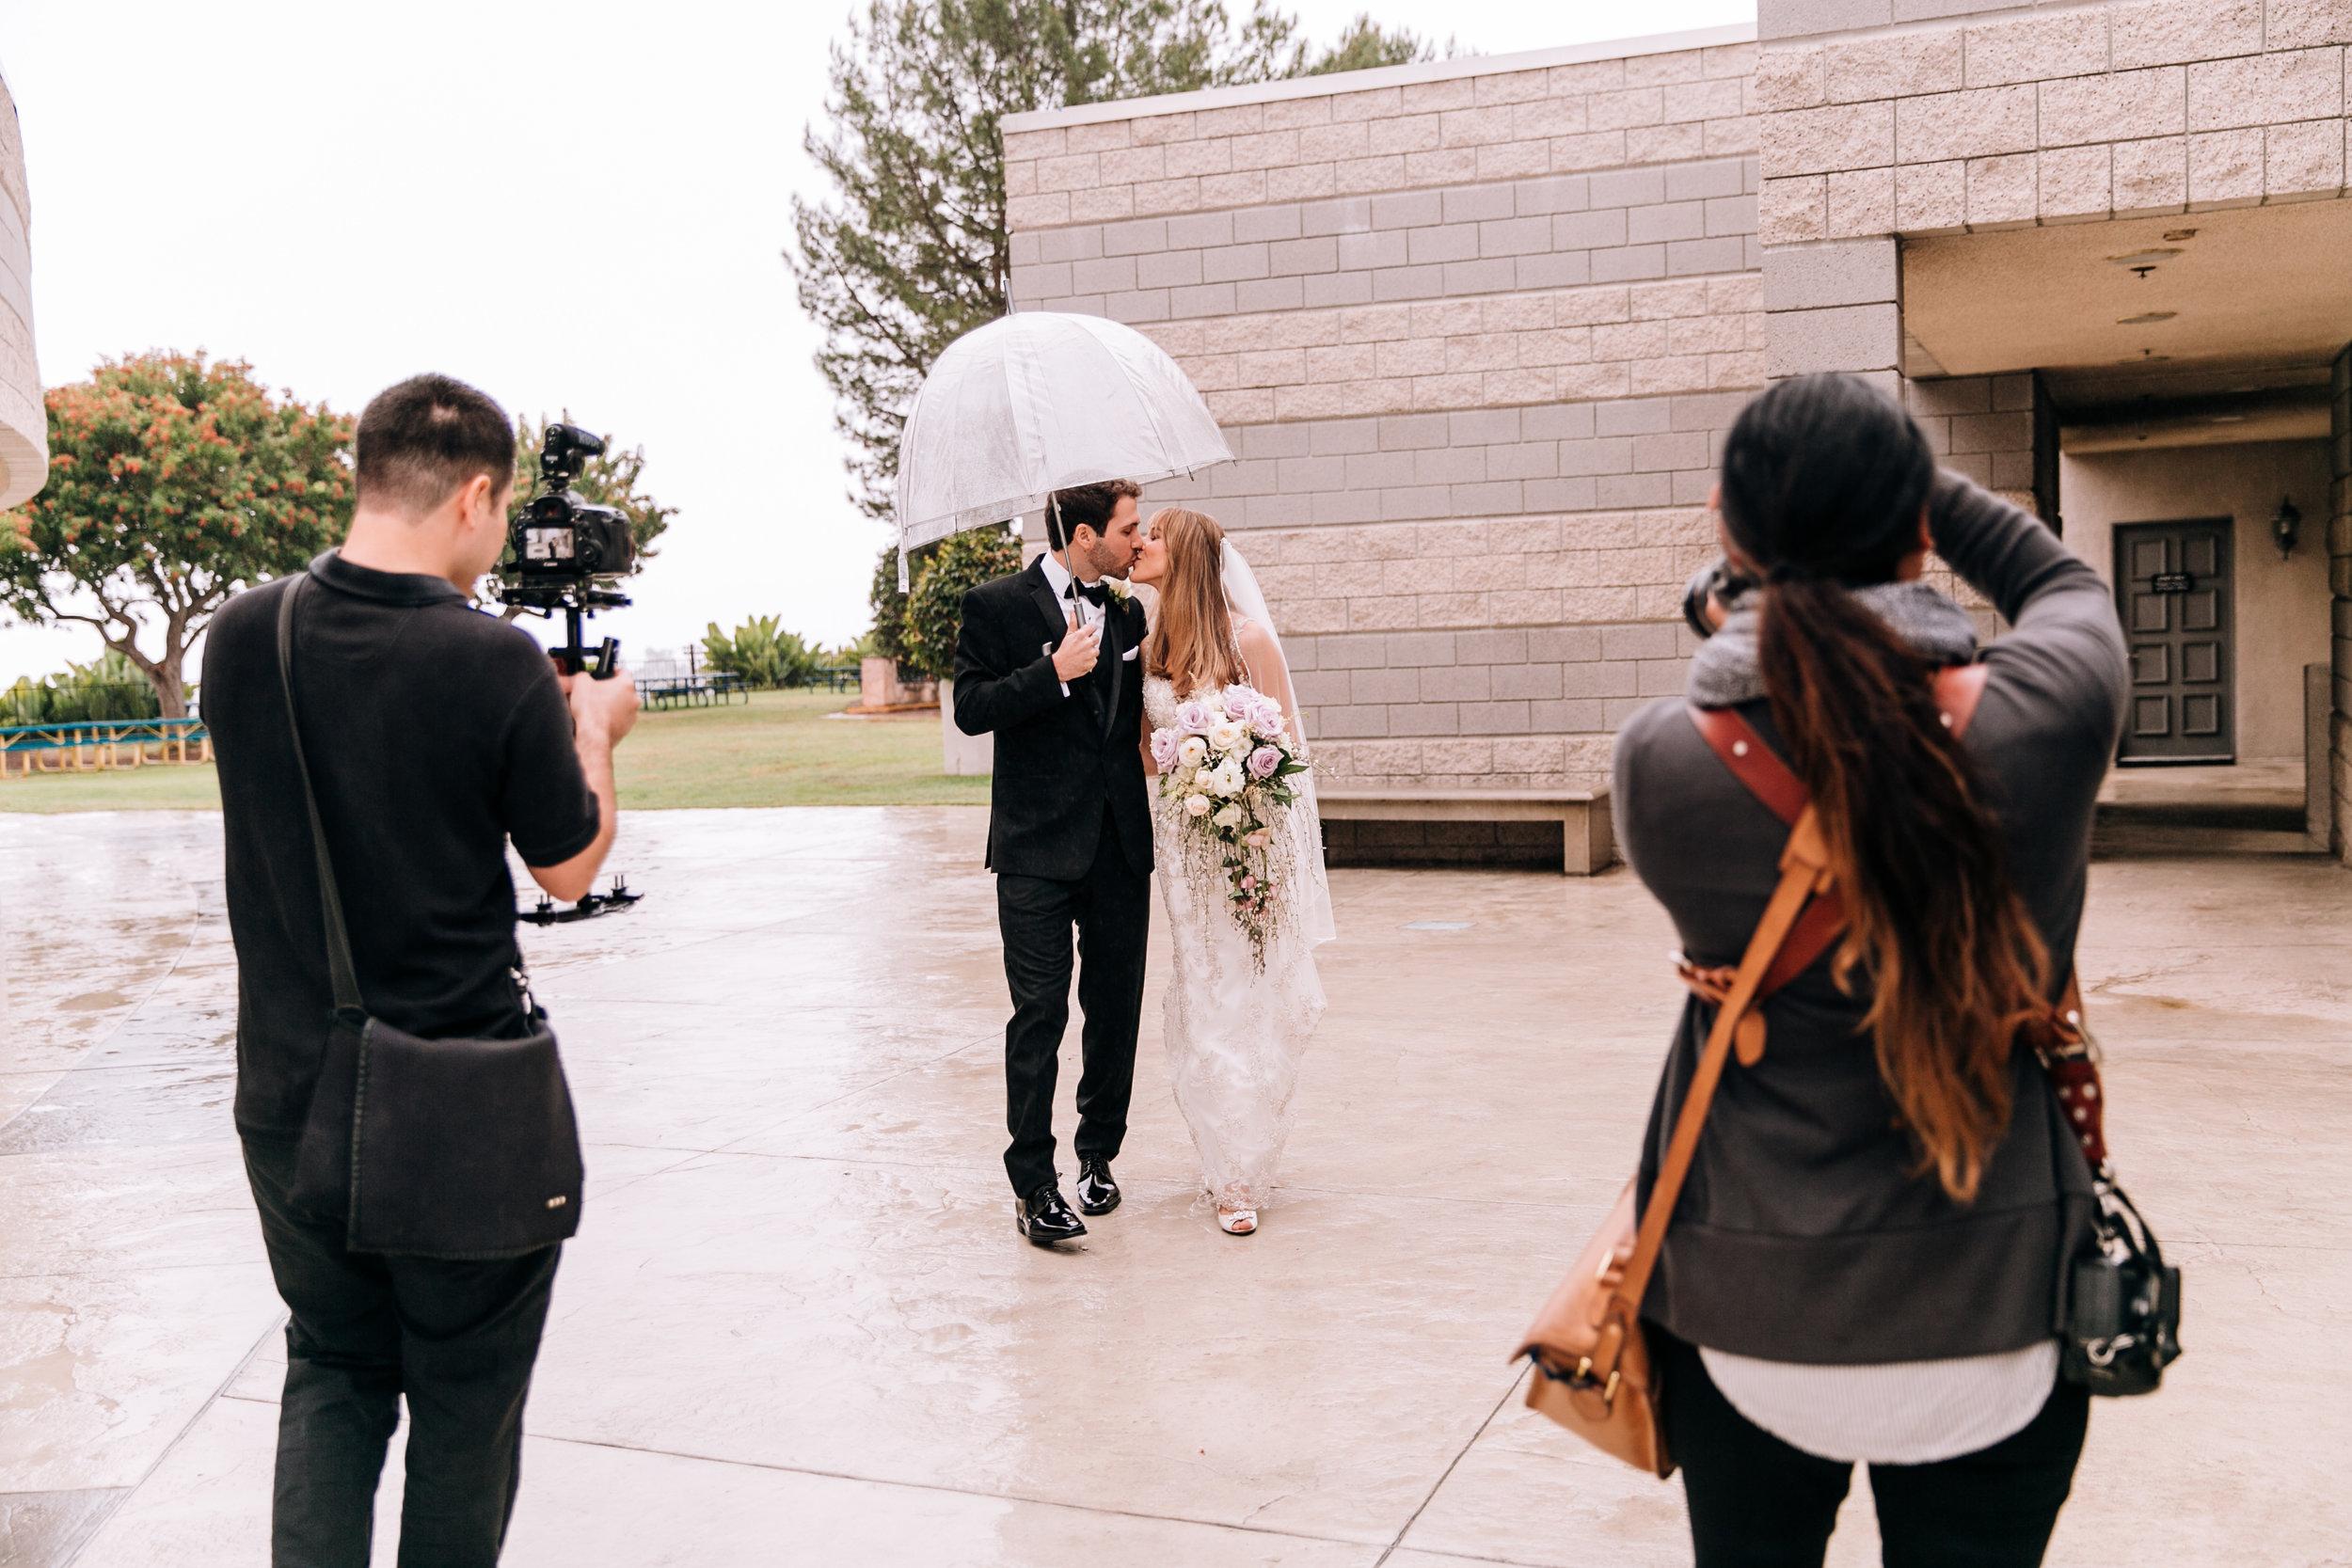 OC wedding photographer, Southern California wedding photographer, Orange County wedding photographer, SoCal wedding photographer, Dana Point Wedding photographer